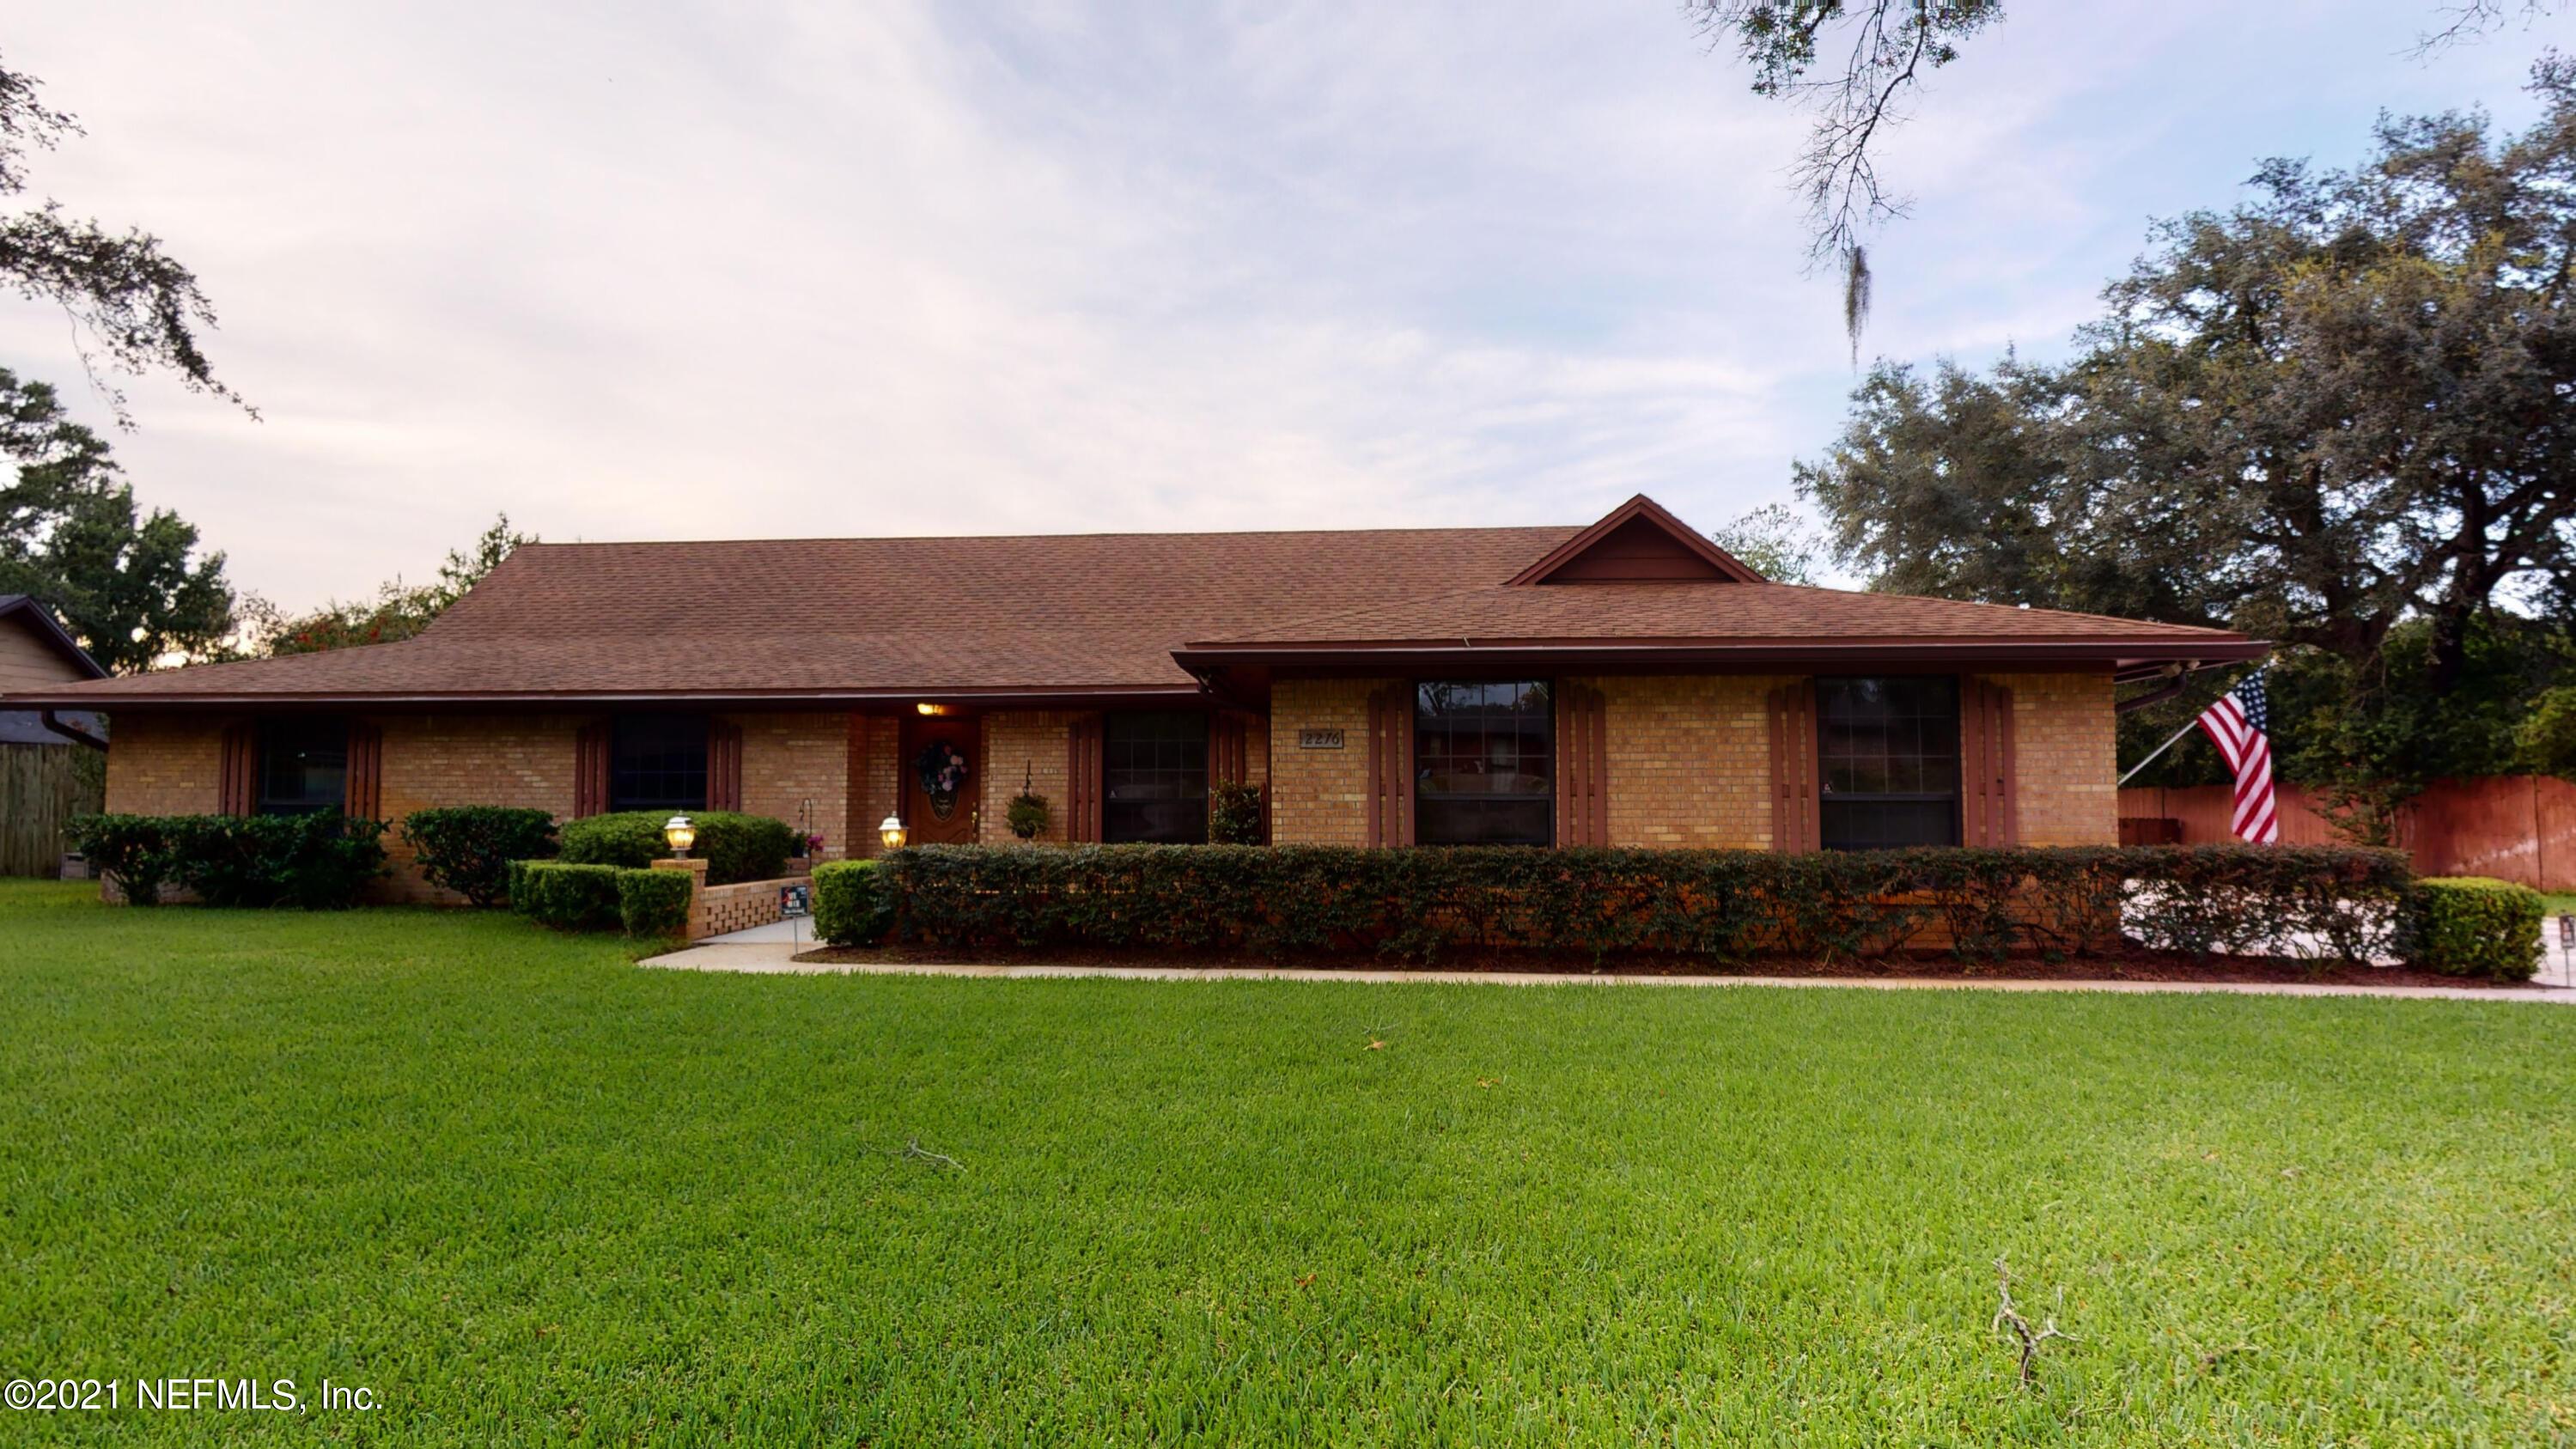 2276 FOXWOOD, ORANGE PARK, FLORIDA 32073, 4 Bedrooms Bedrooms, ,2 BathroomsBathrooms,Residential,For sale,FOXWOOD,1123542